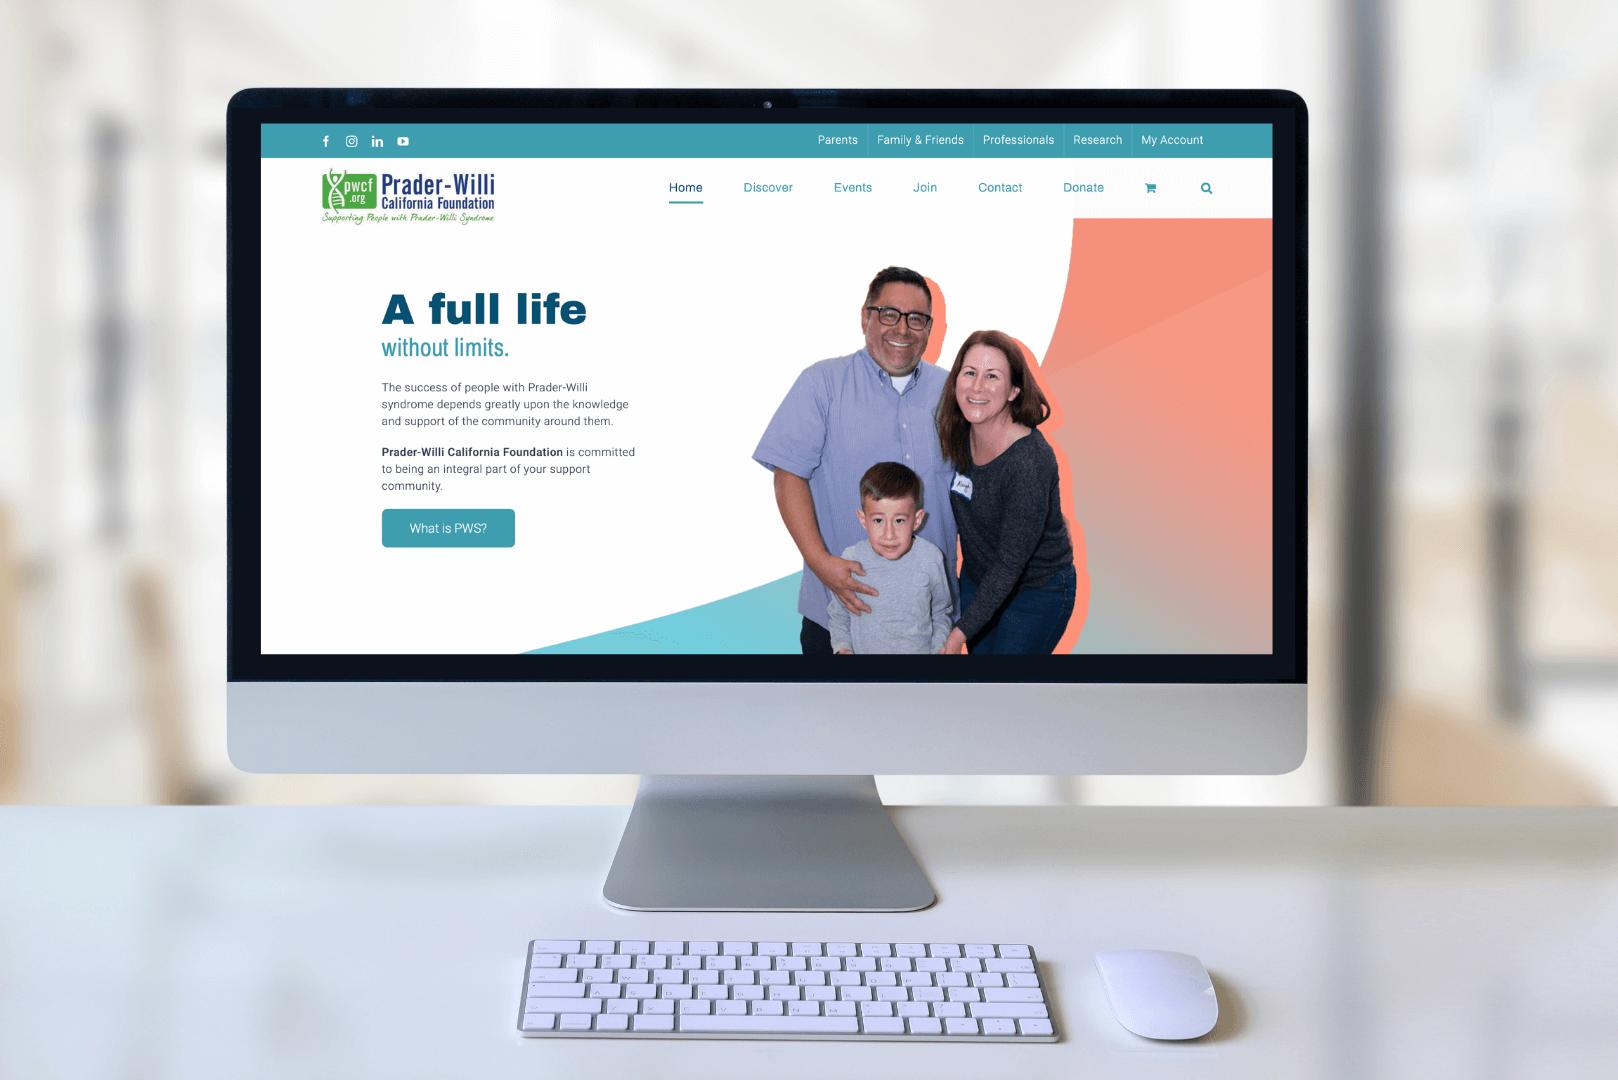 digital marketing agency for nonprofits